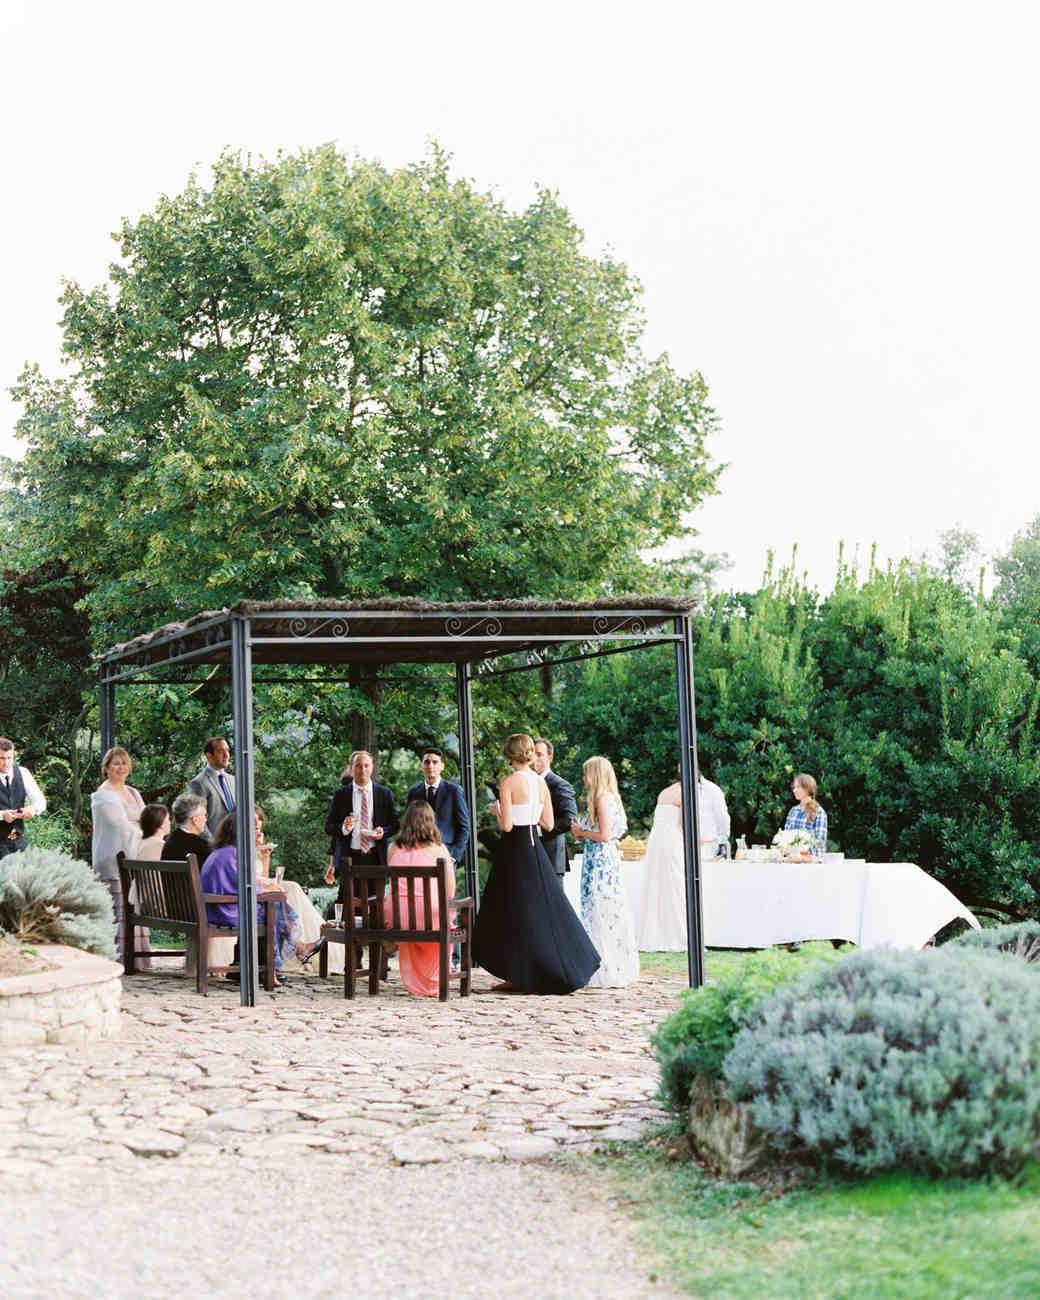 christine-dagan-wedding-cocktail-hour-4277_13-s113011-0616.jpg